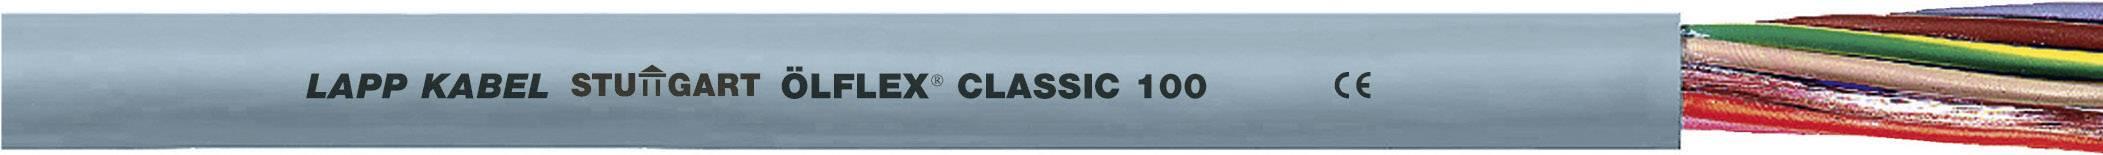 Kabel LappKabel Ölflex CLASSIC 100 2X1,5 (00100634), PVC, 6,3 mm, 500 V, šedá, 1000 m